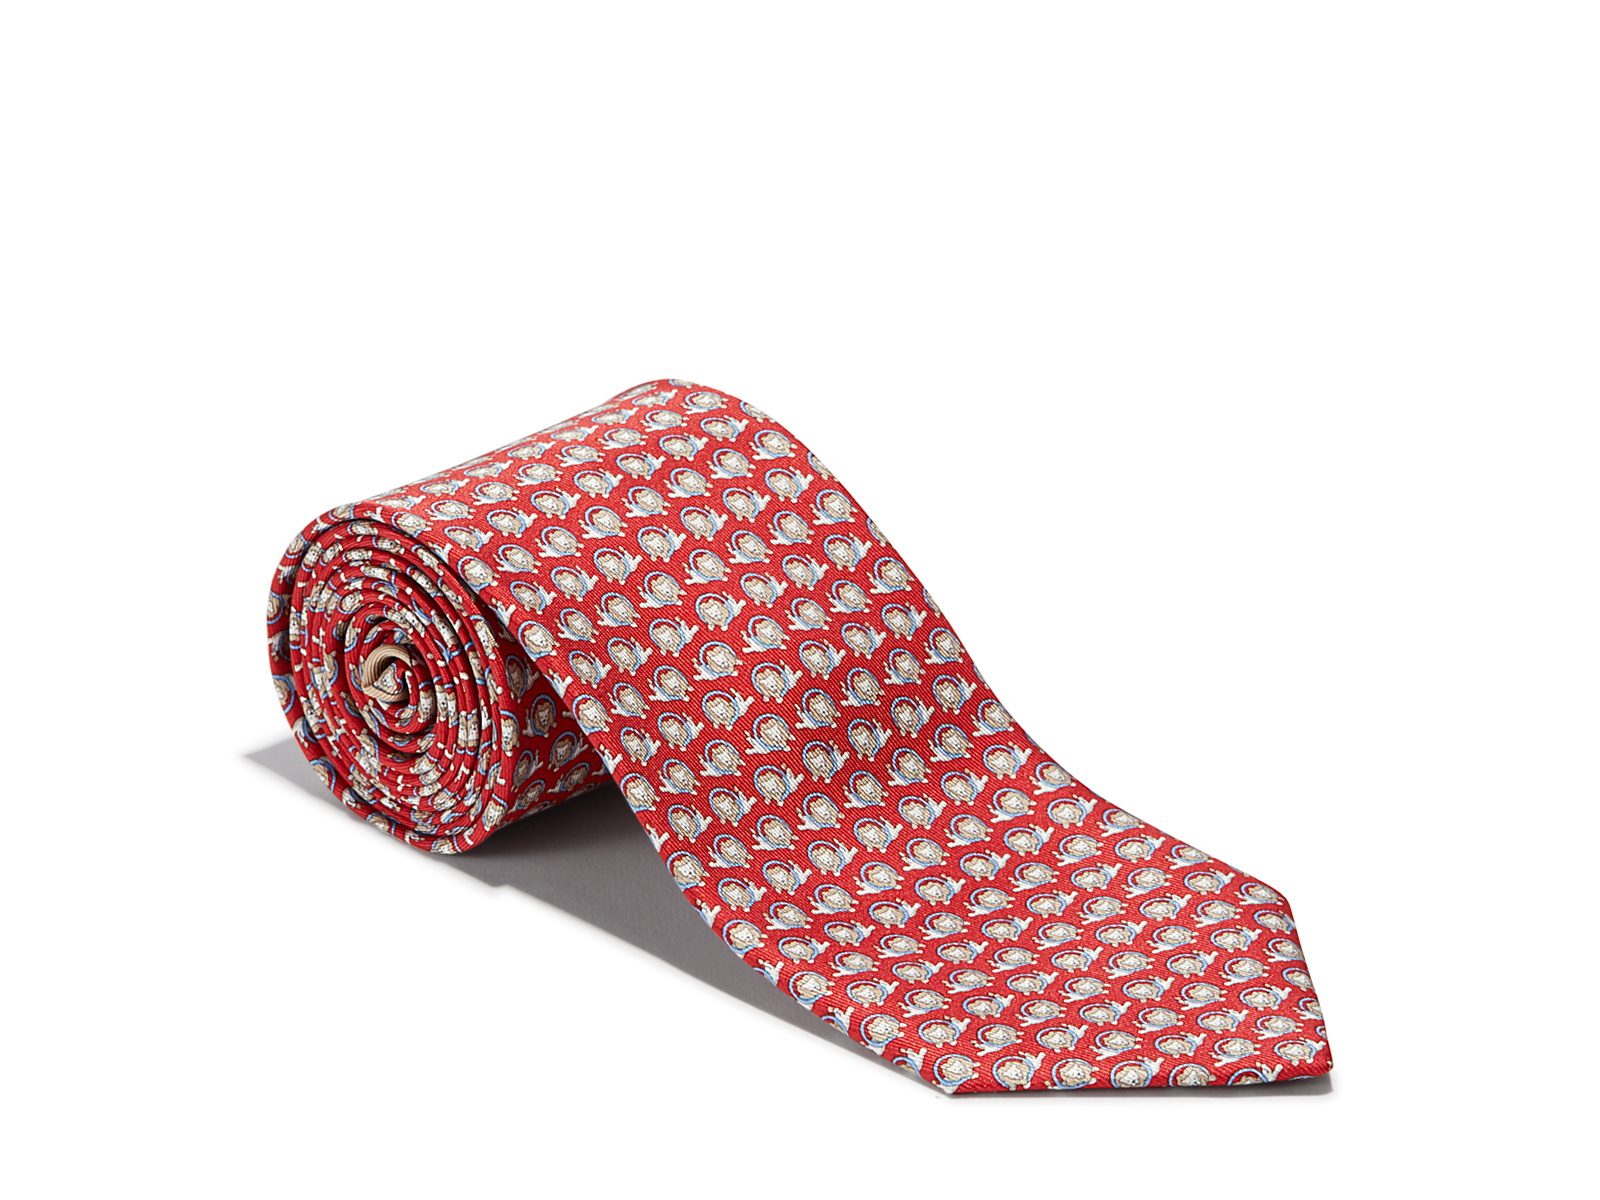 Ferragamo Lions Printed Tie in Red for Men - Lyst